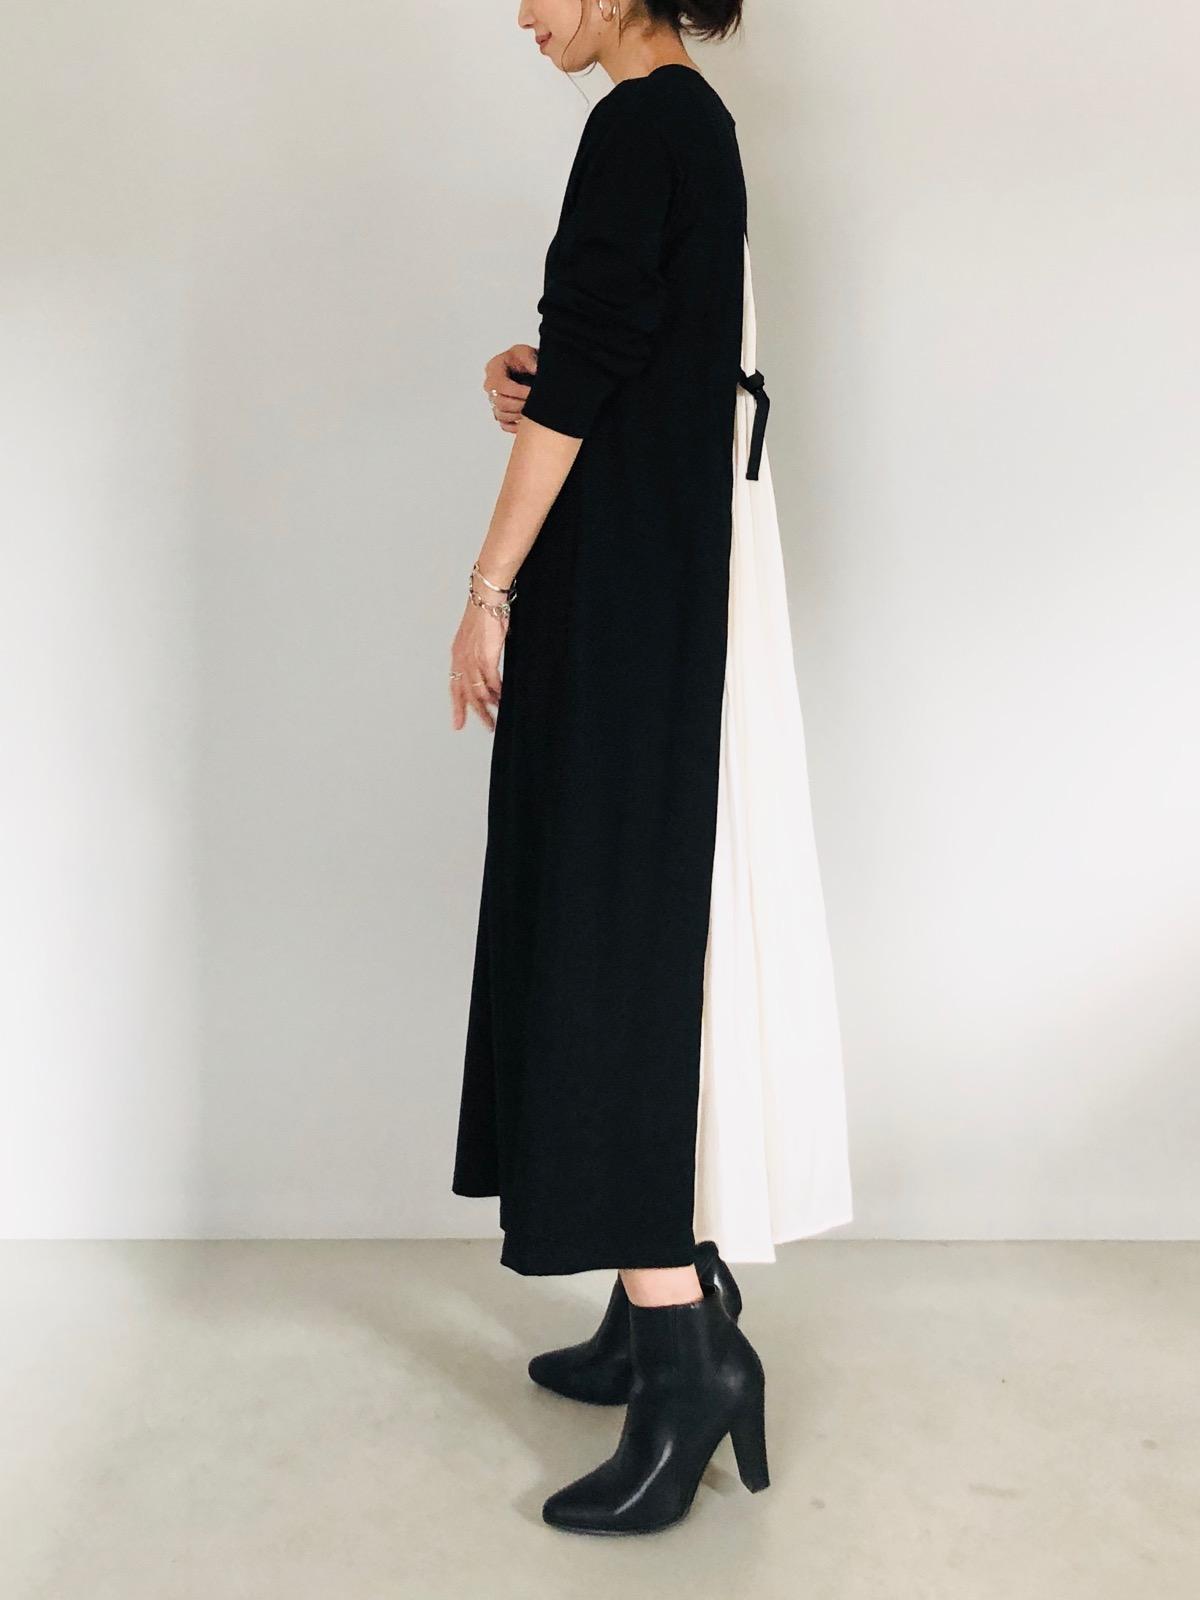 SELECT(セレクト) 長袖異素材バックサテンカットロングワンピース 30%